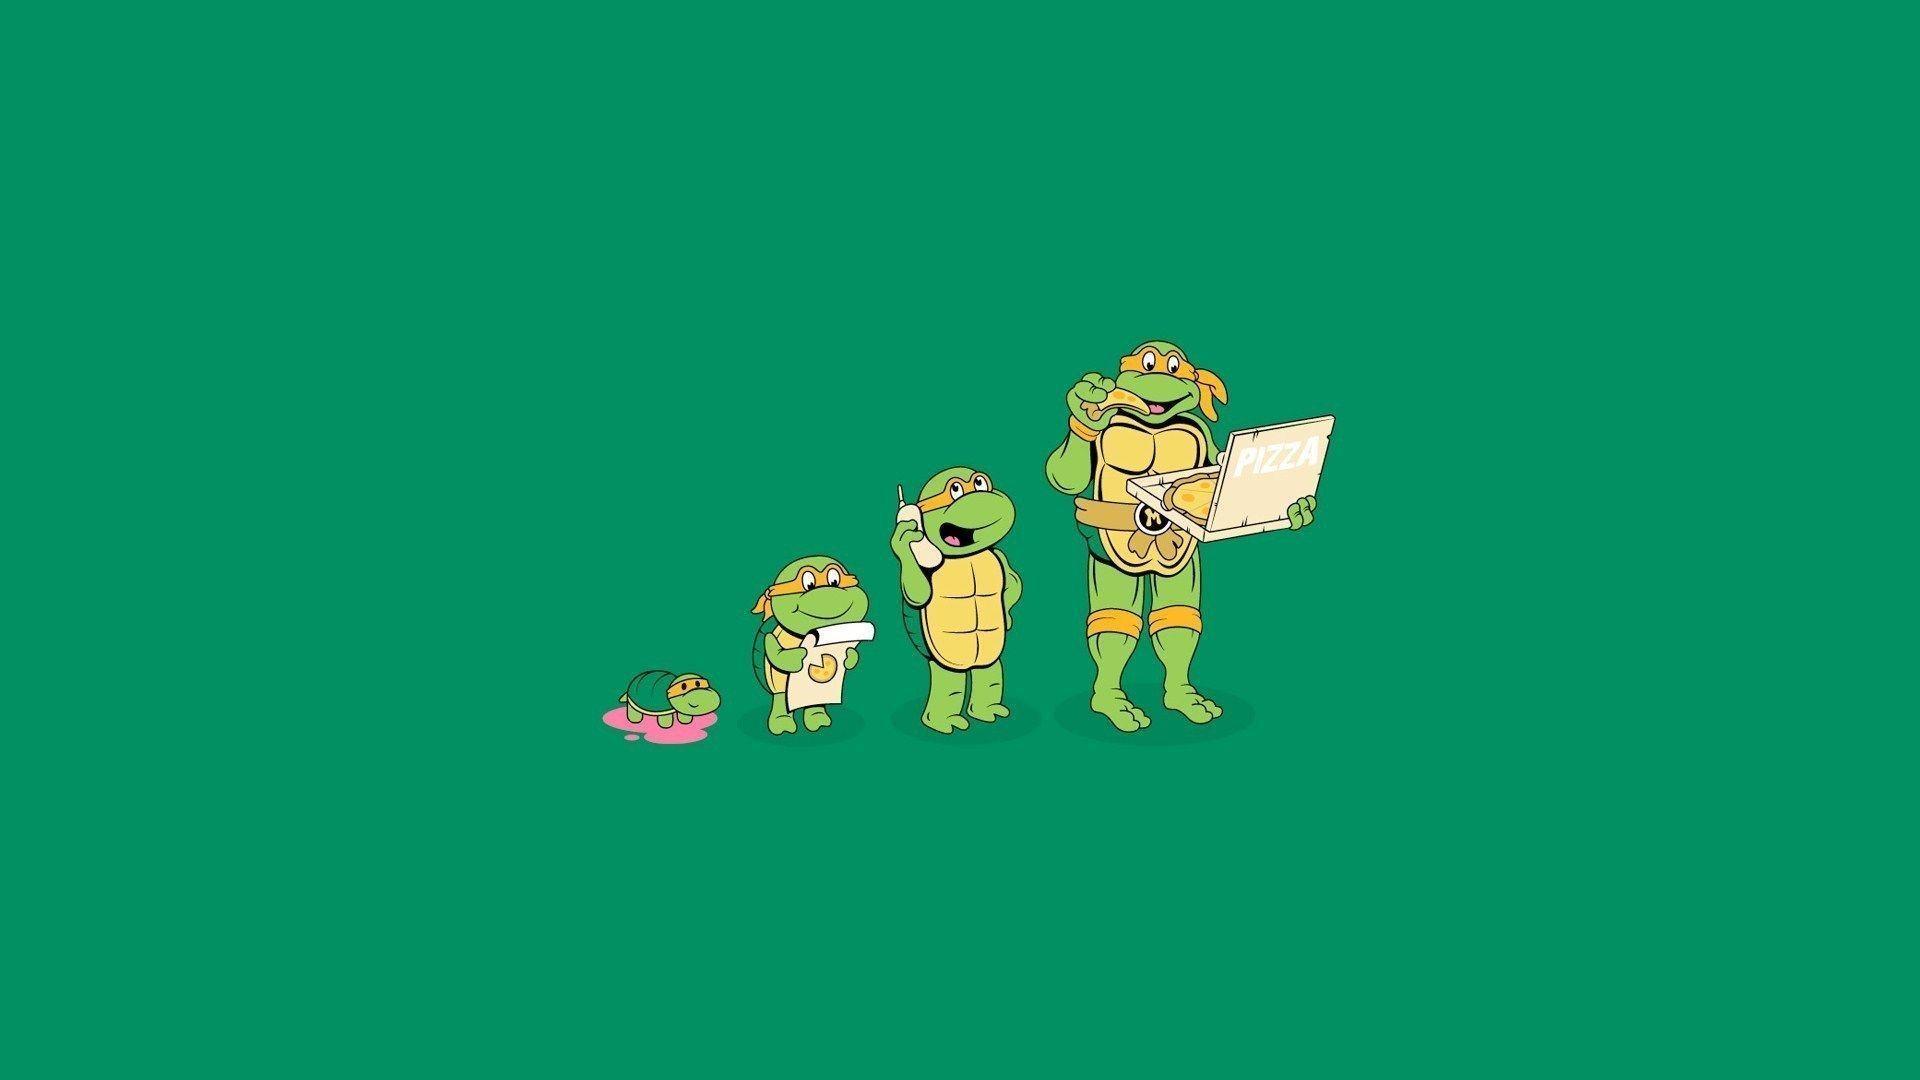 Res: 1920x1080, Teenage Mutant Ninja Turtles 2015 Wallpapers - Wallpaper Cave